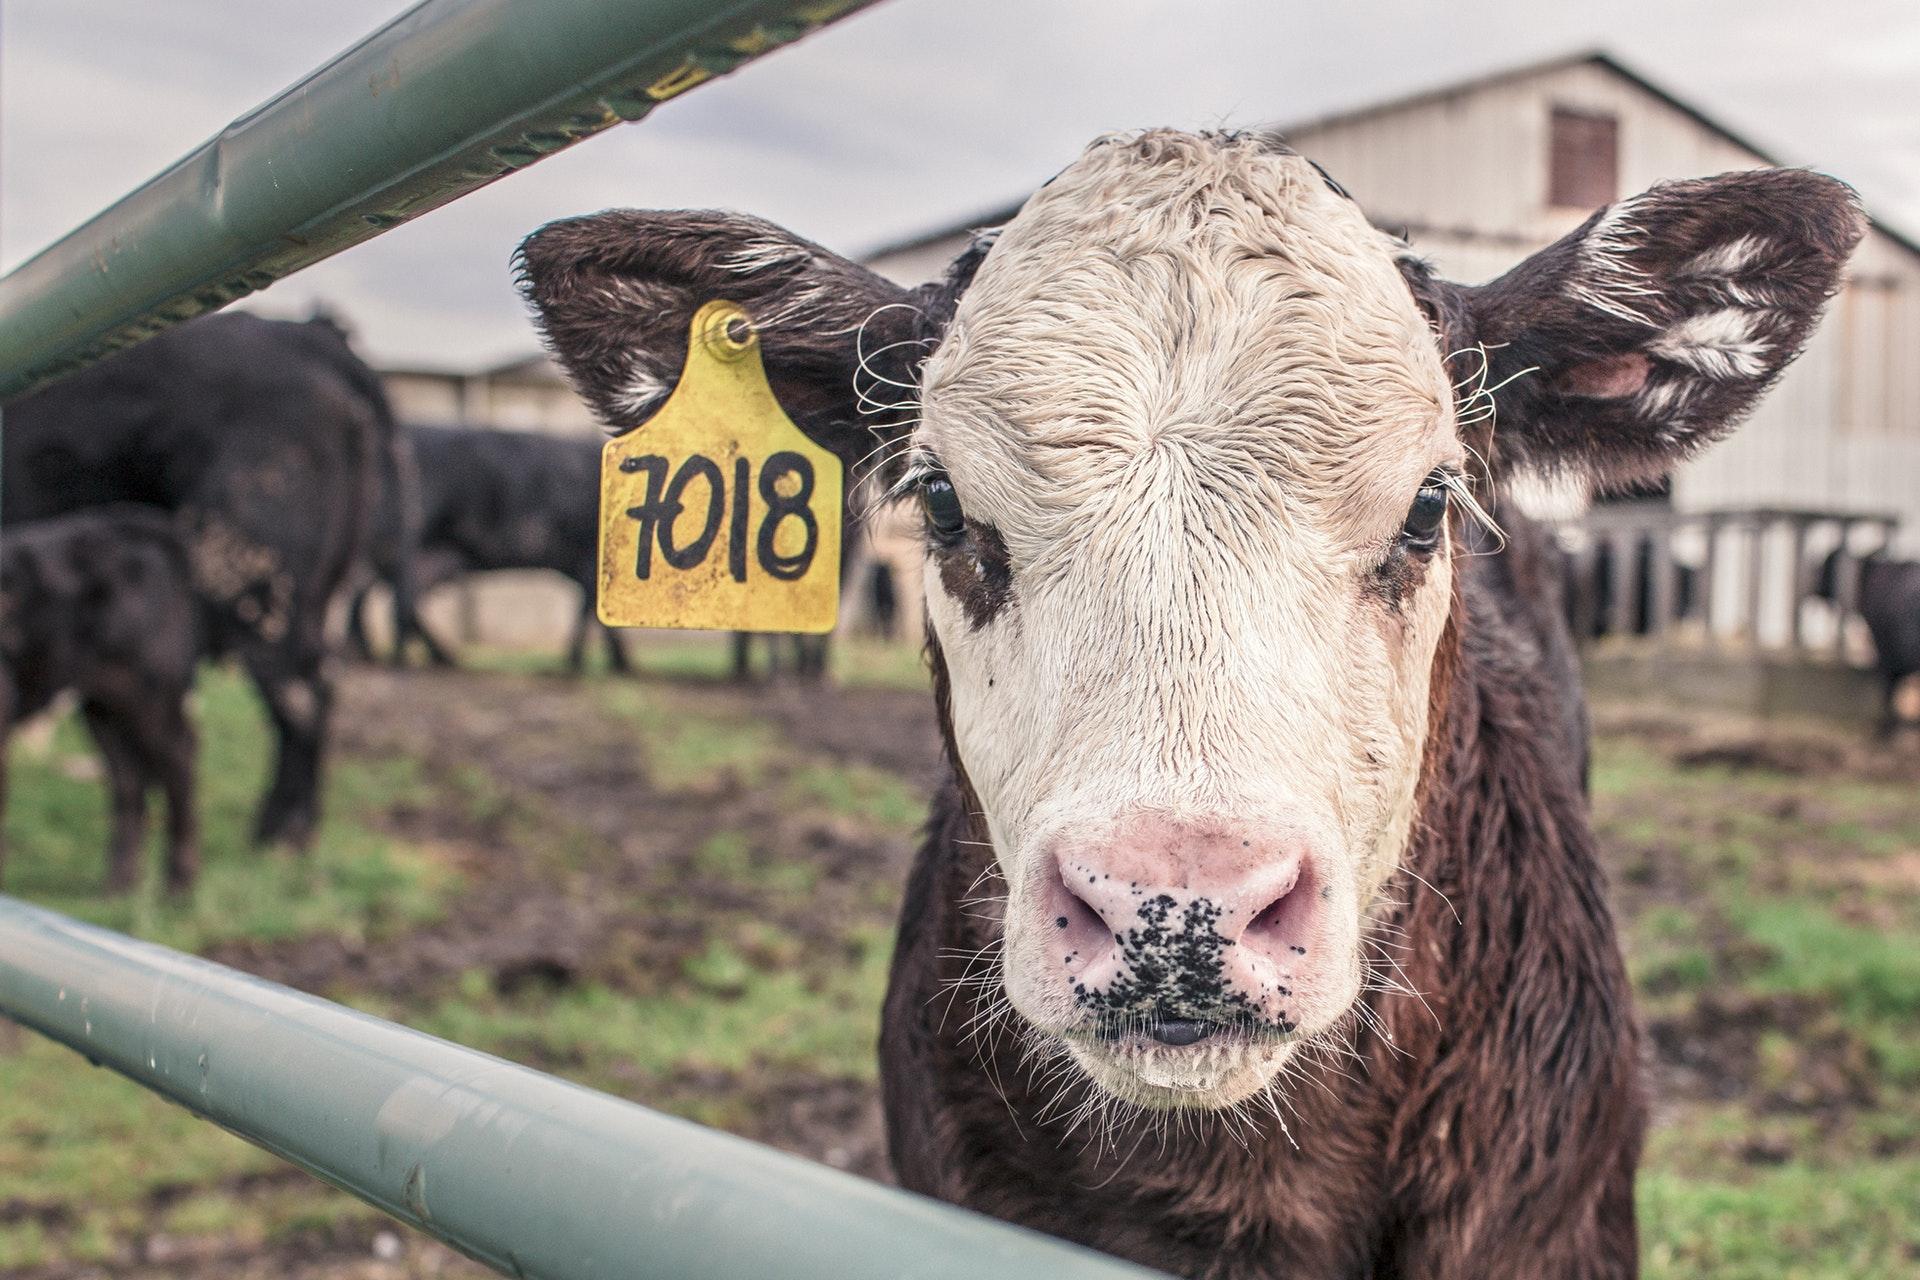 Calf looking through iron gate